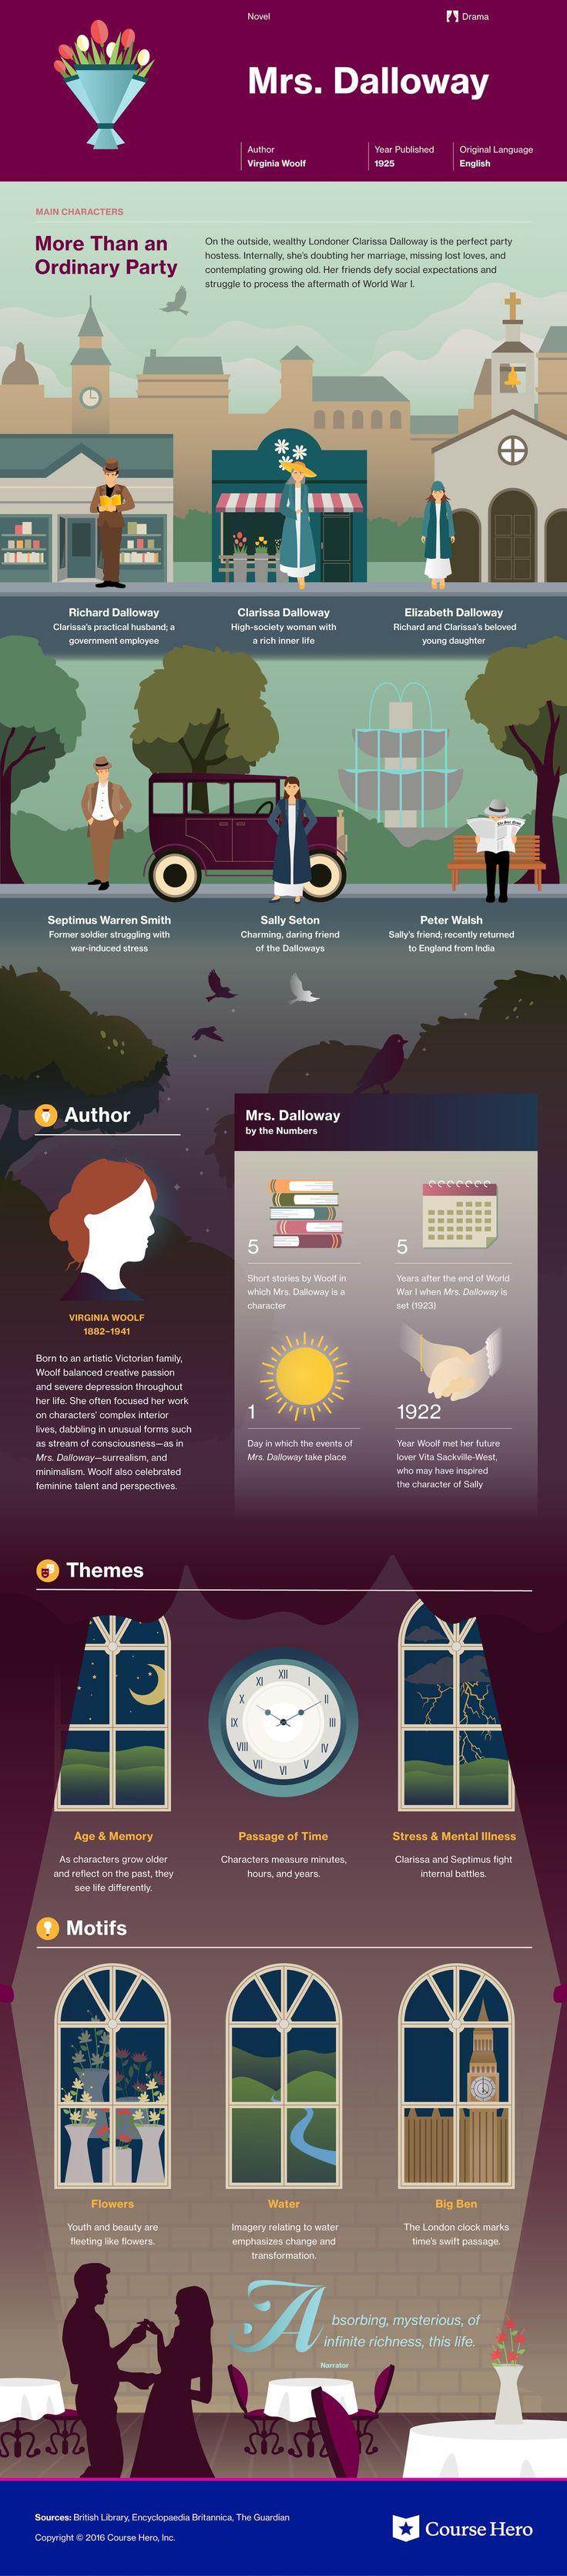 Mrs. Dalloway infographic